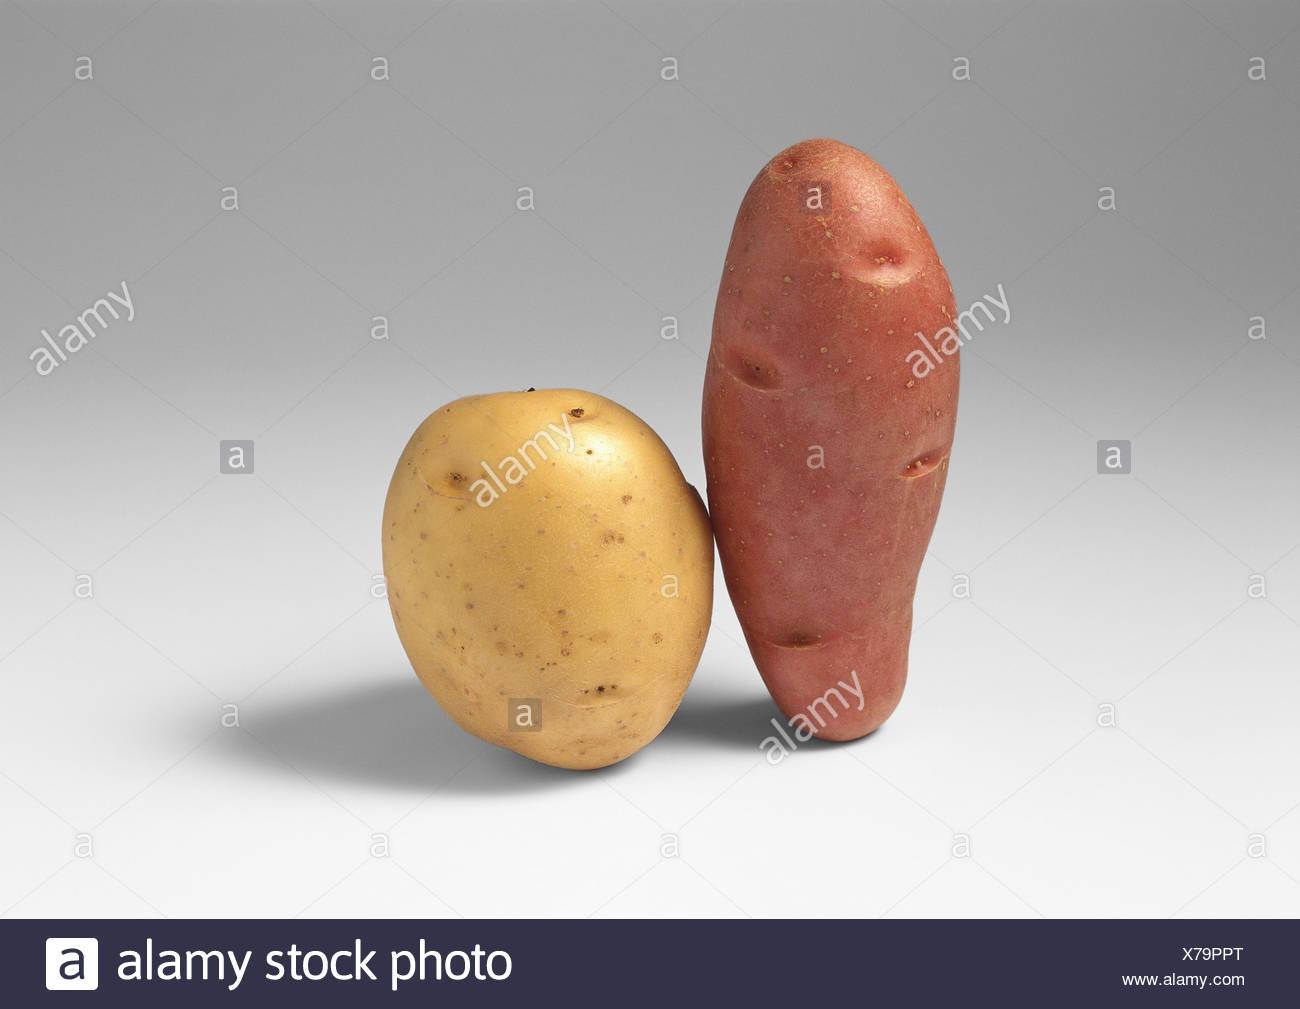 Potatoes - Stock Image